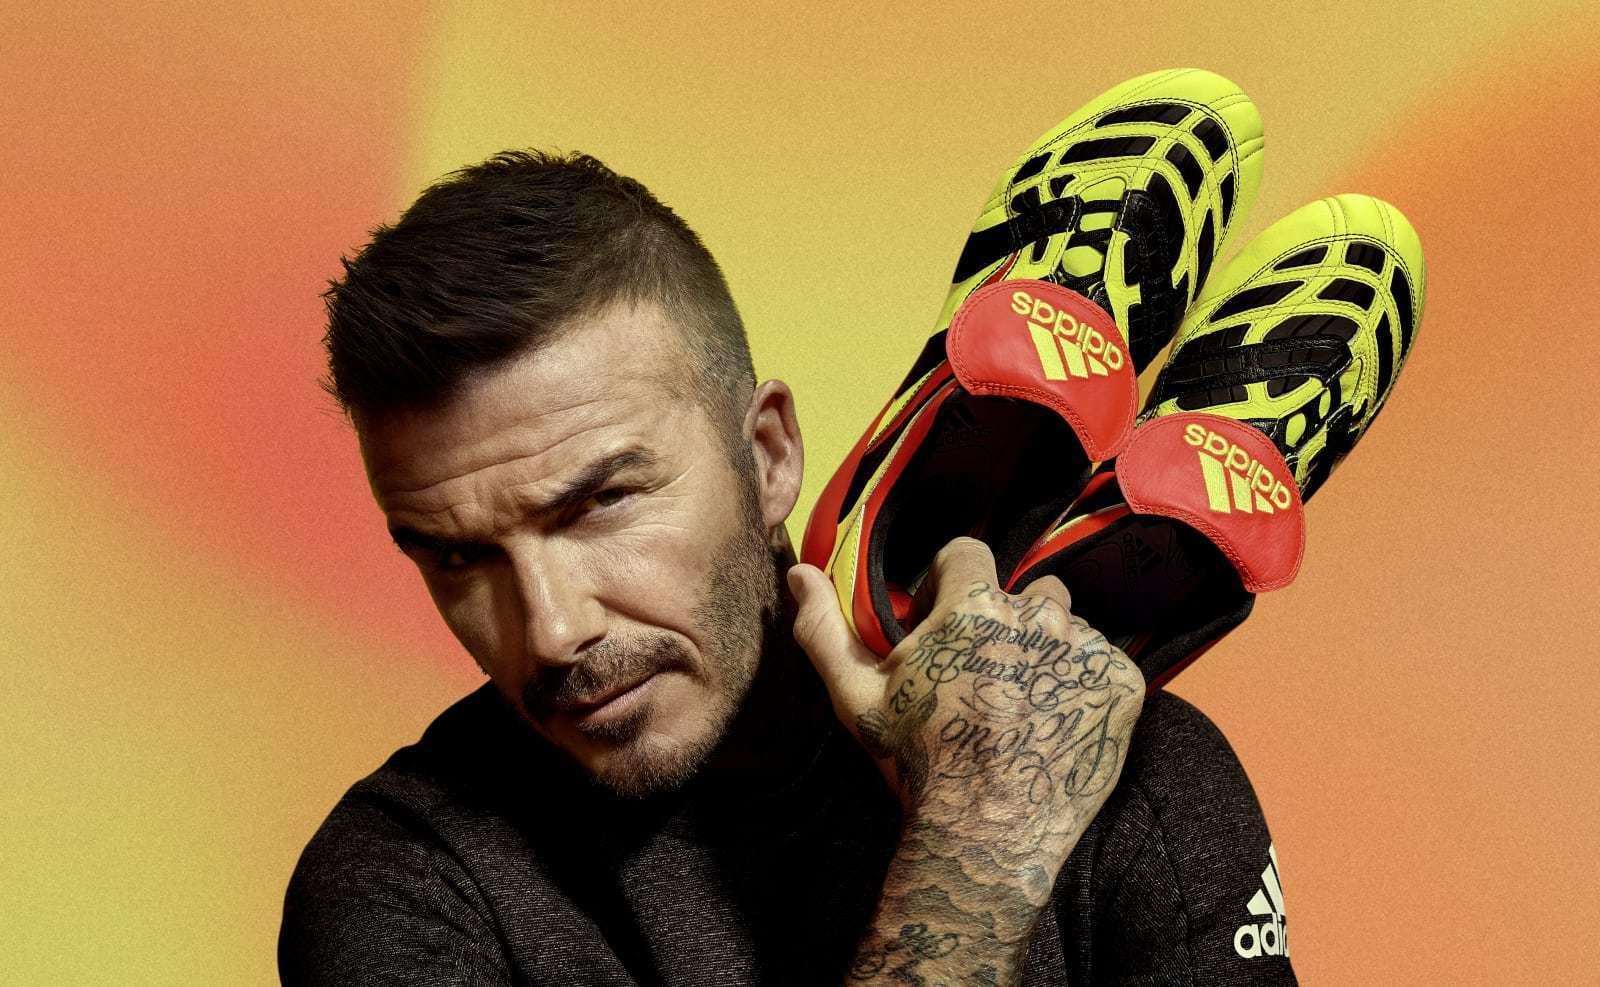 Adidas Prossoator Accelerator FG Cleats Diuominiiones 9 to 13 Beckham Zidane gituttio BB7412